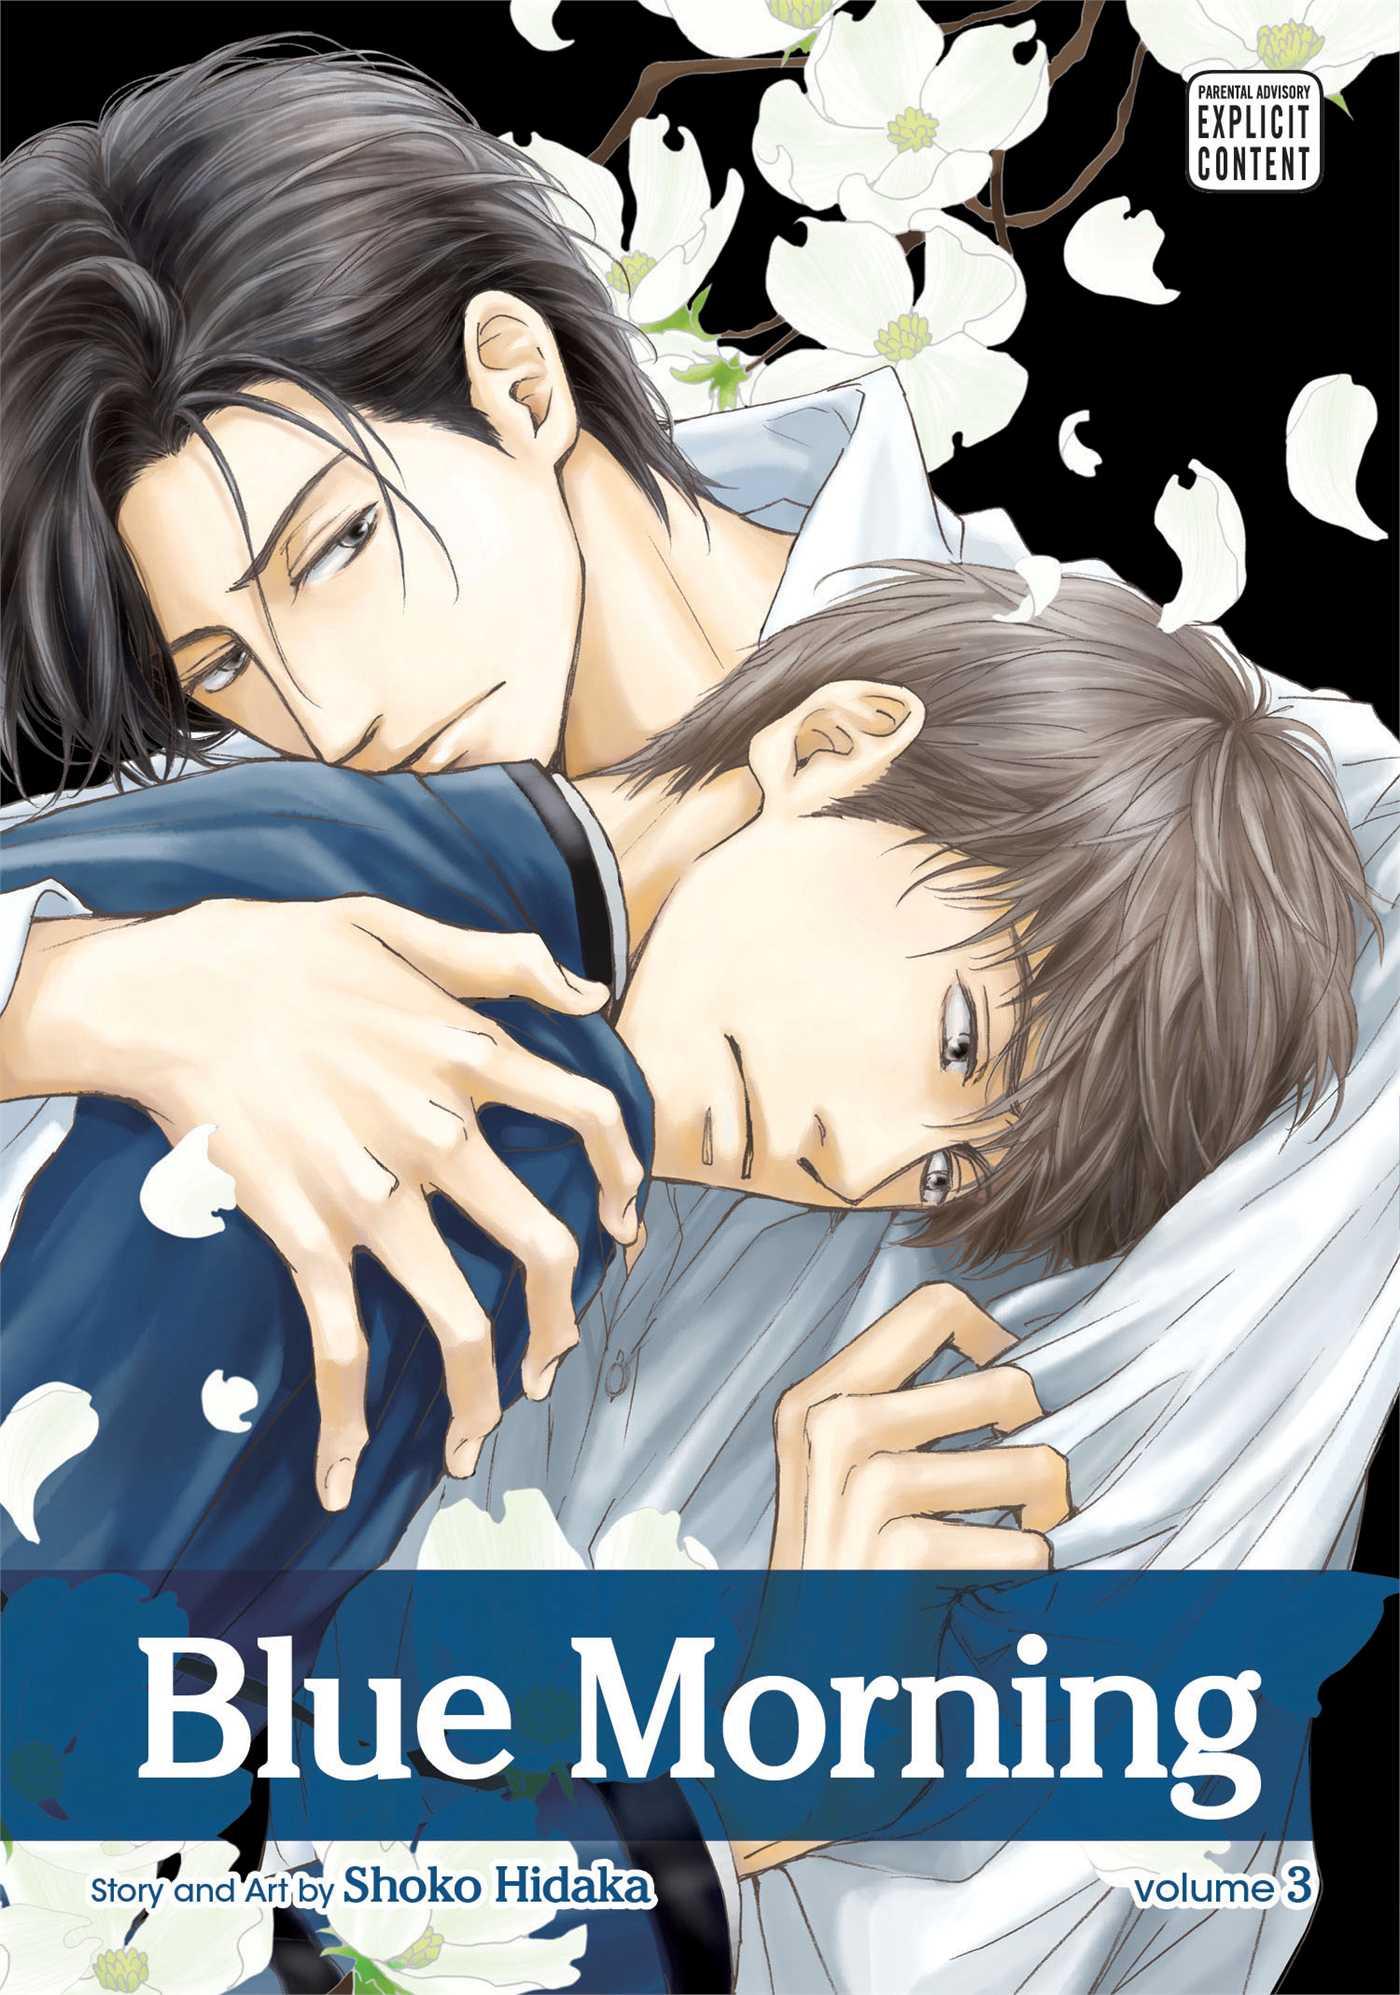 Blue morning vol 3 9781421555546 hr